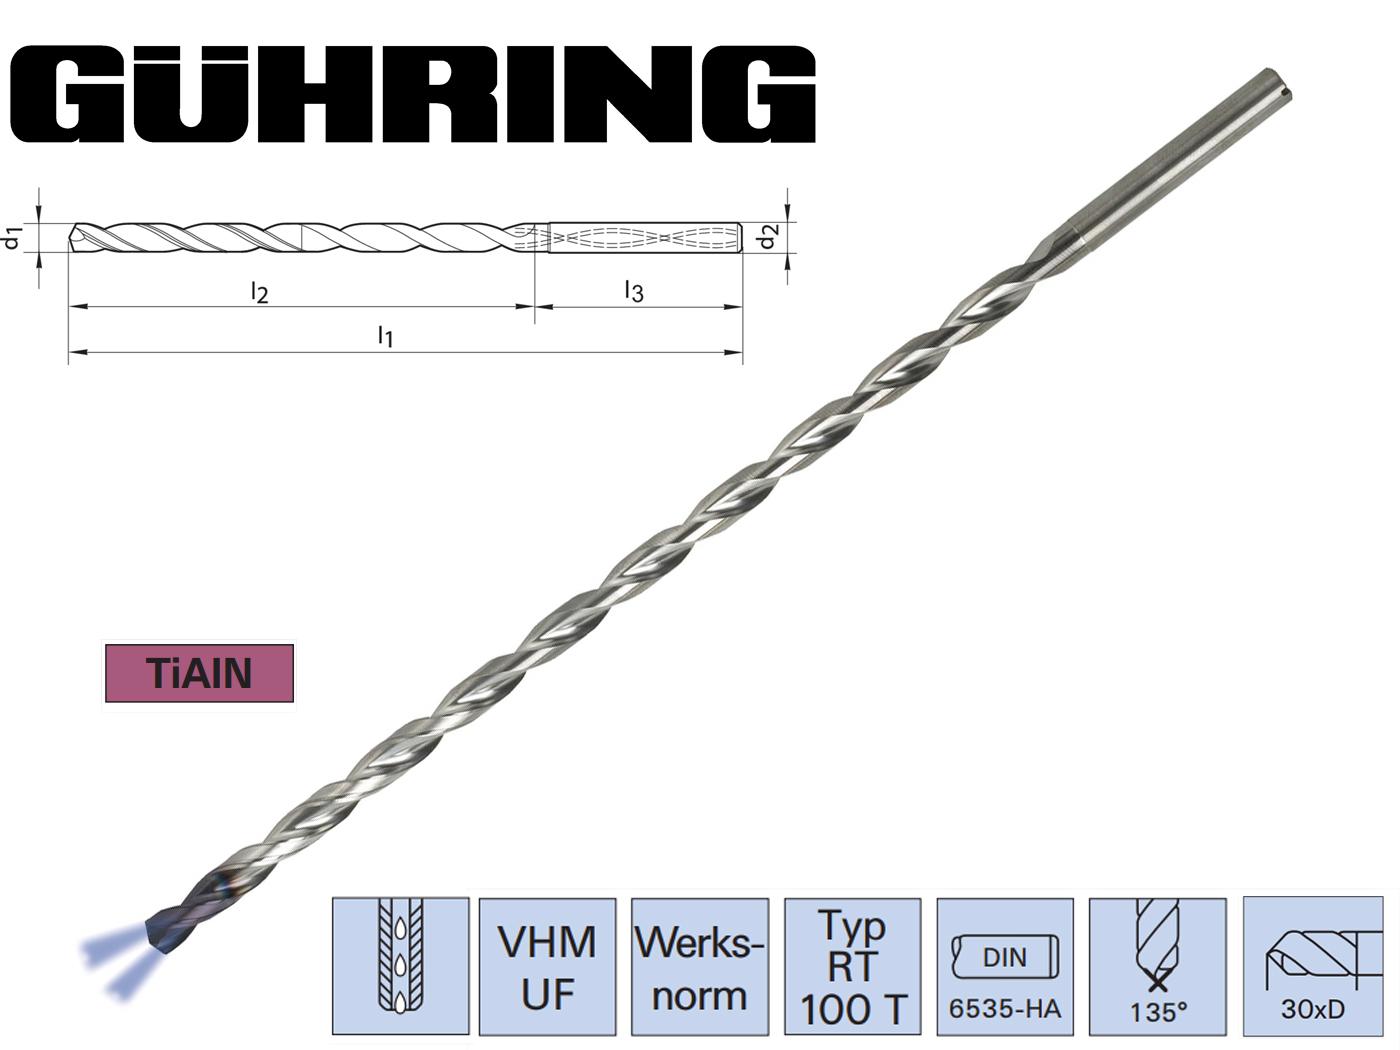 VHM DIEPGATBOOR WN HA 30xD TiAlN Guhring | DKMTools - DKM Tools